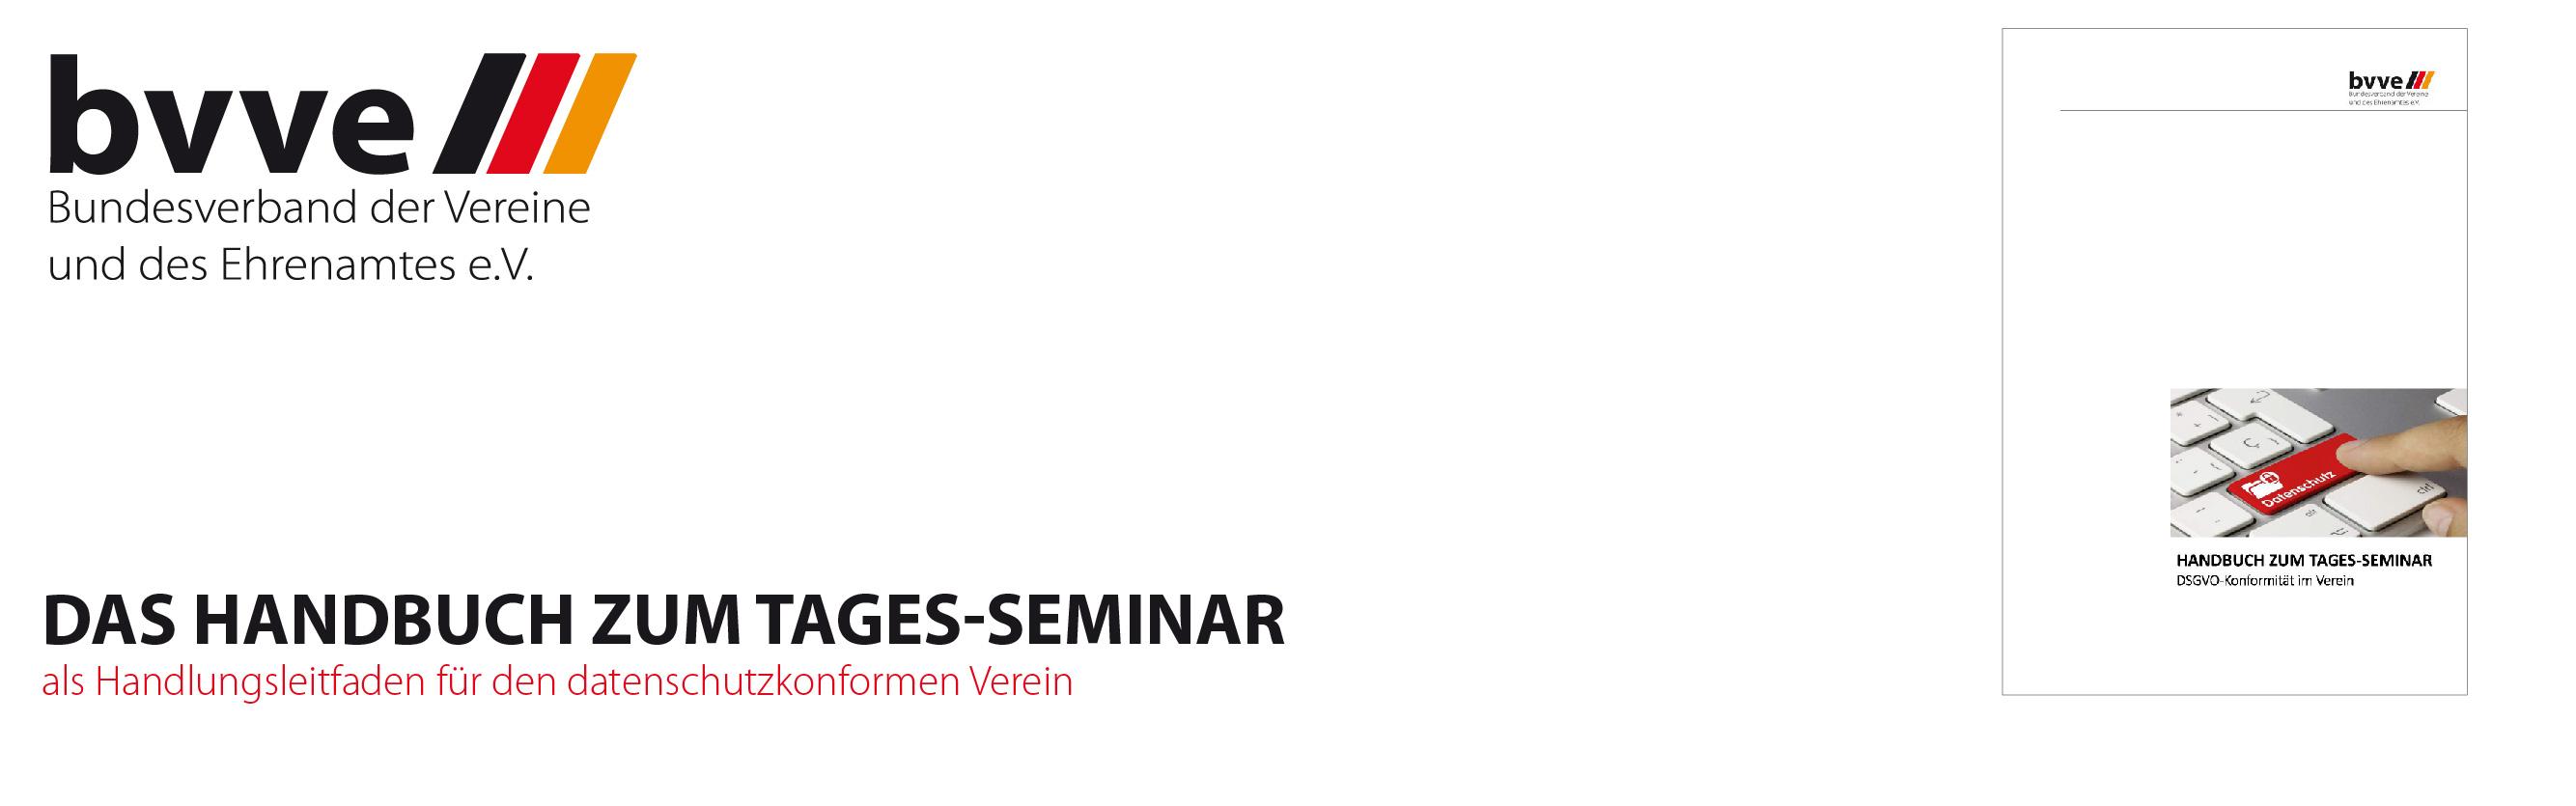 Das Handbuch zum Tages-Seminar